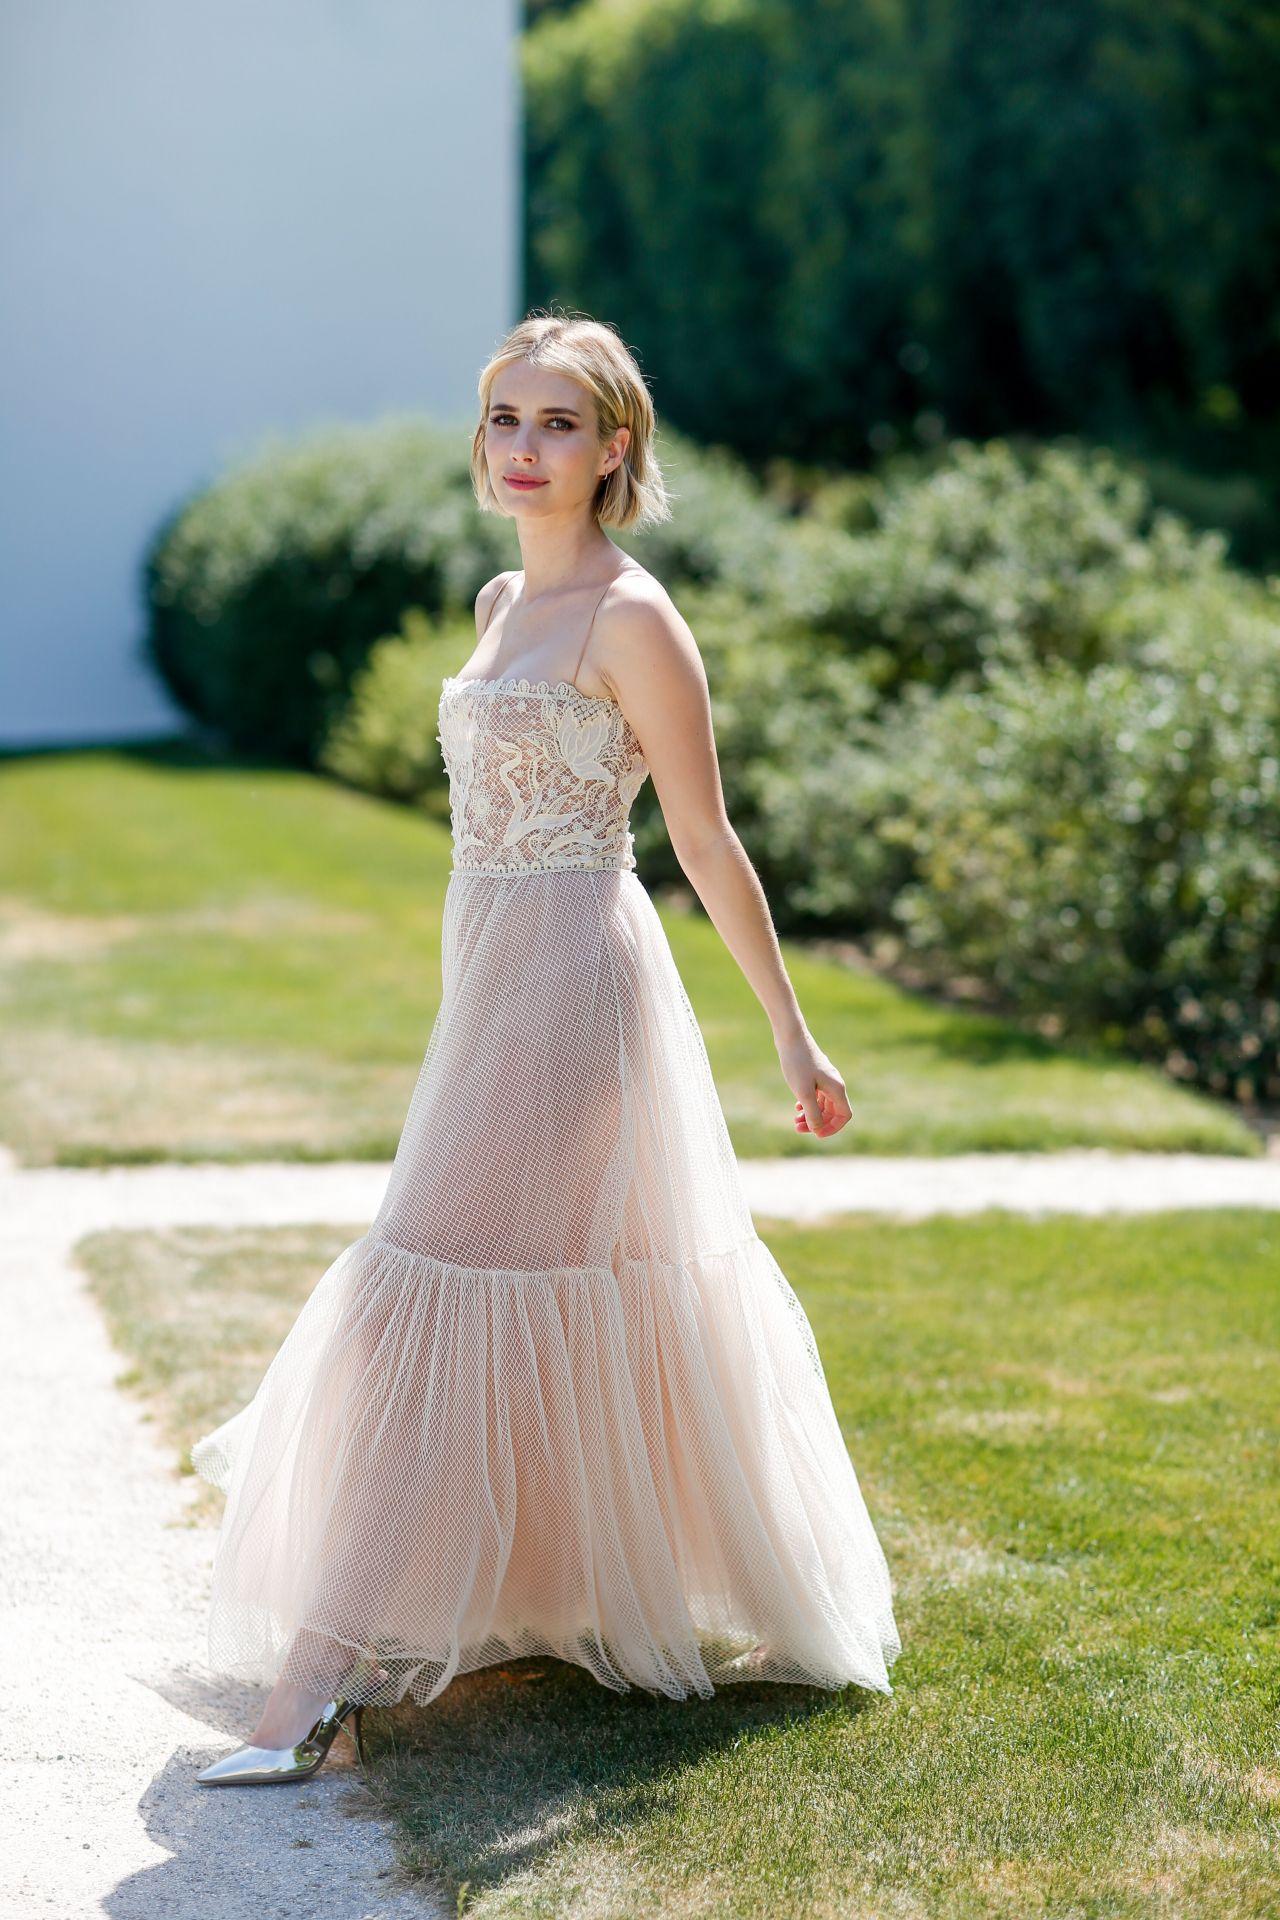 https://celebmafia.com/wp-content/uploads/2018/07/emma-roberts-arriving-at-dior-fall-winter-2018-2019-haute-couture-show-in-paris-3.jpg